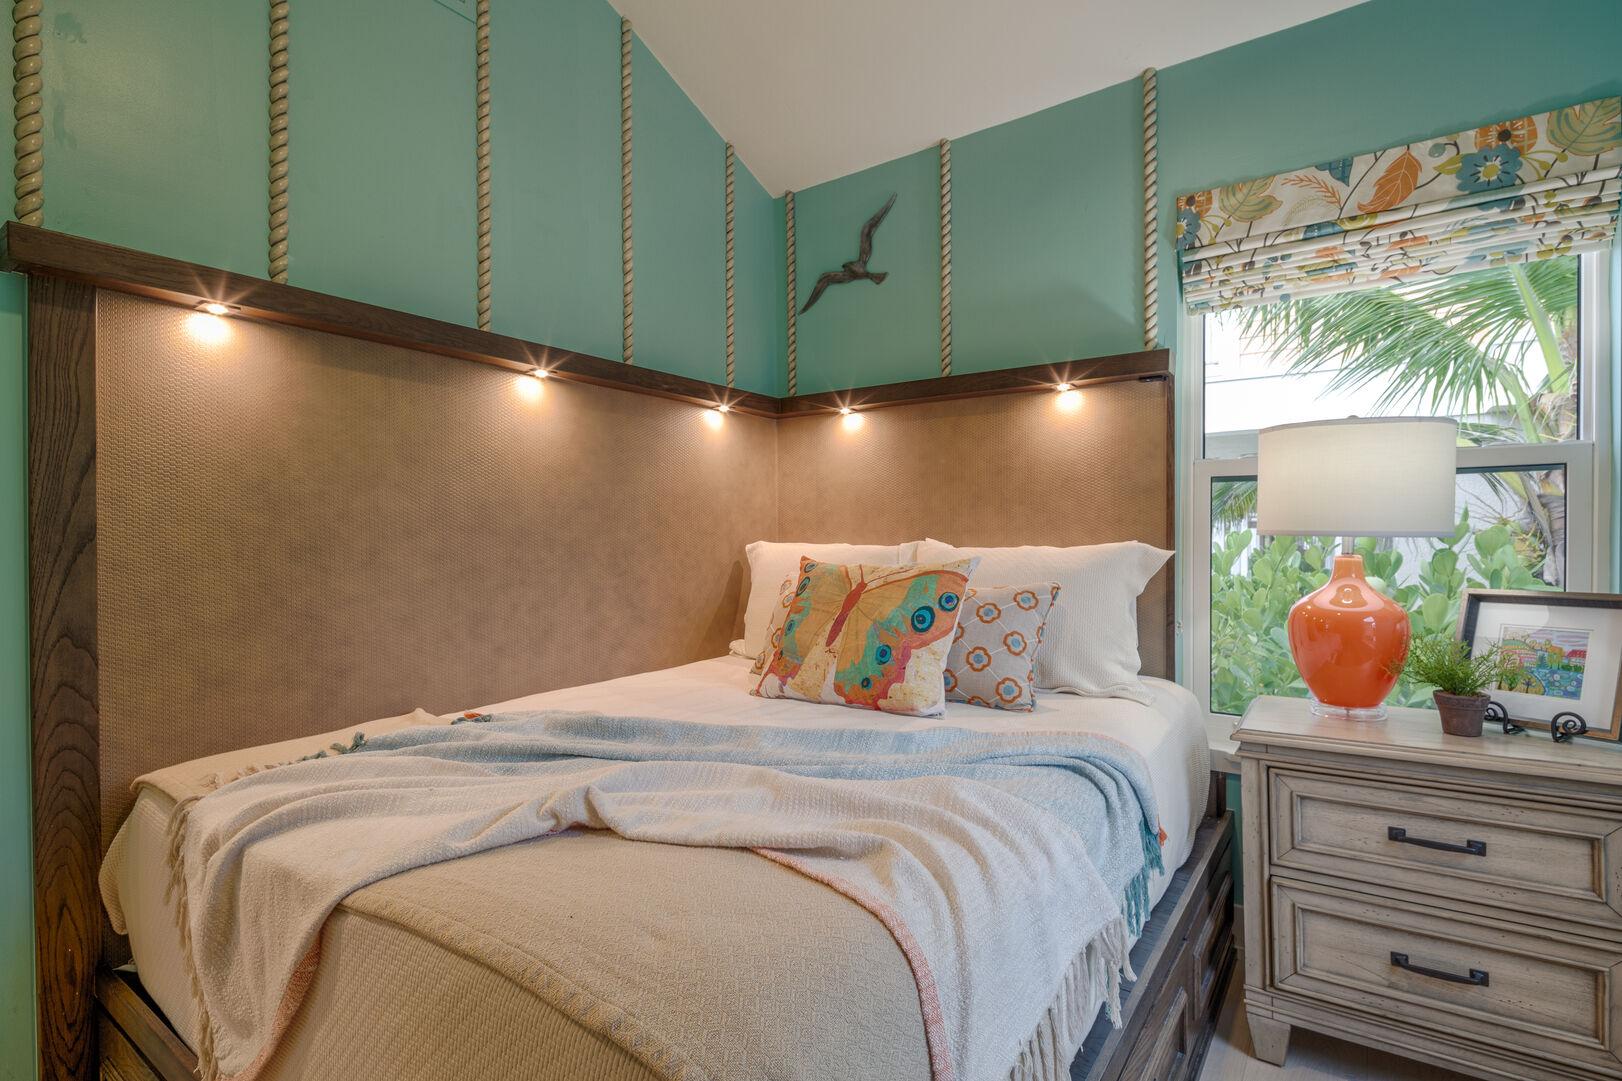 Bedroom with Beach Decor at Beach Rental Fort Myers Beach